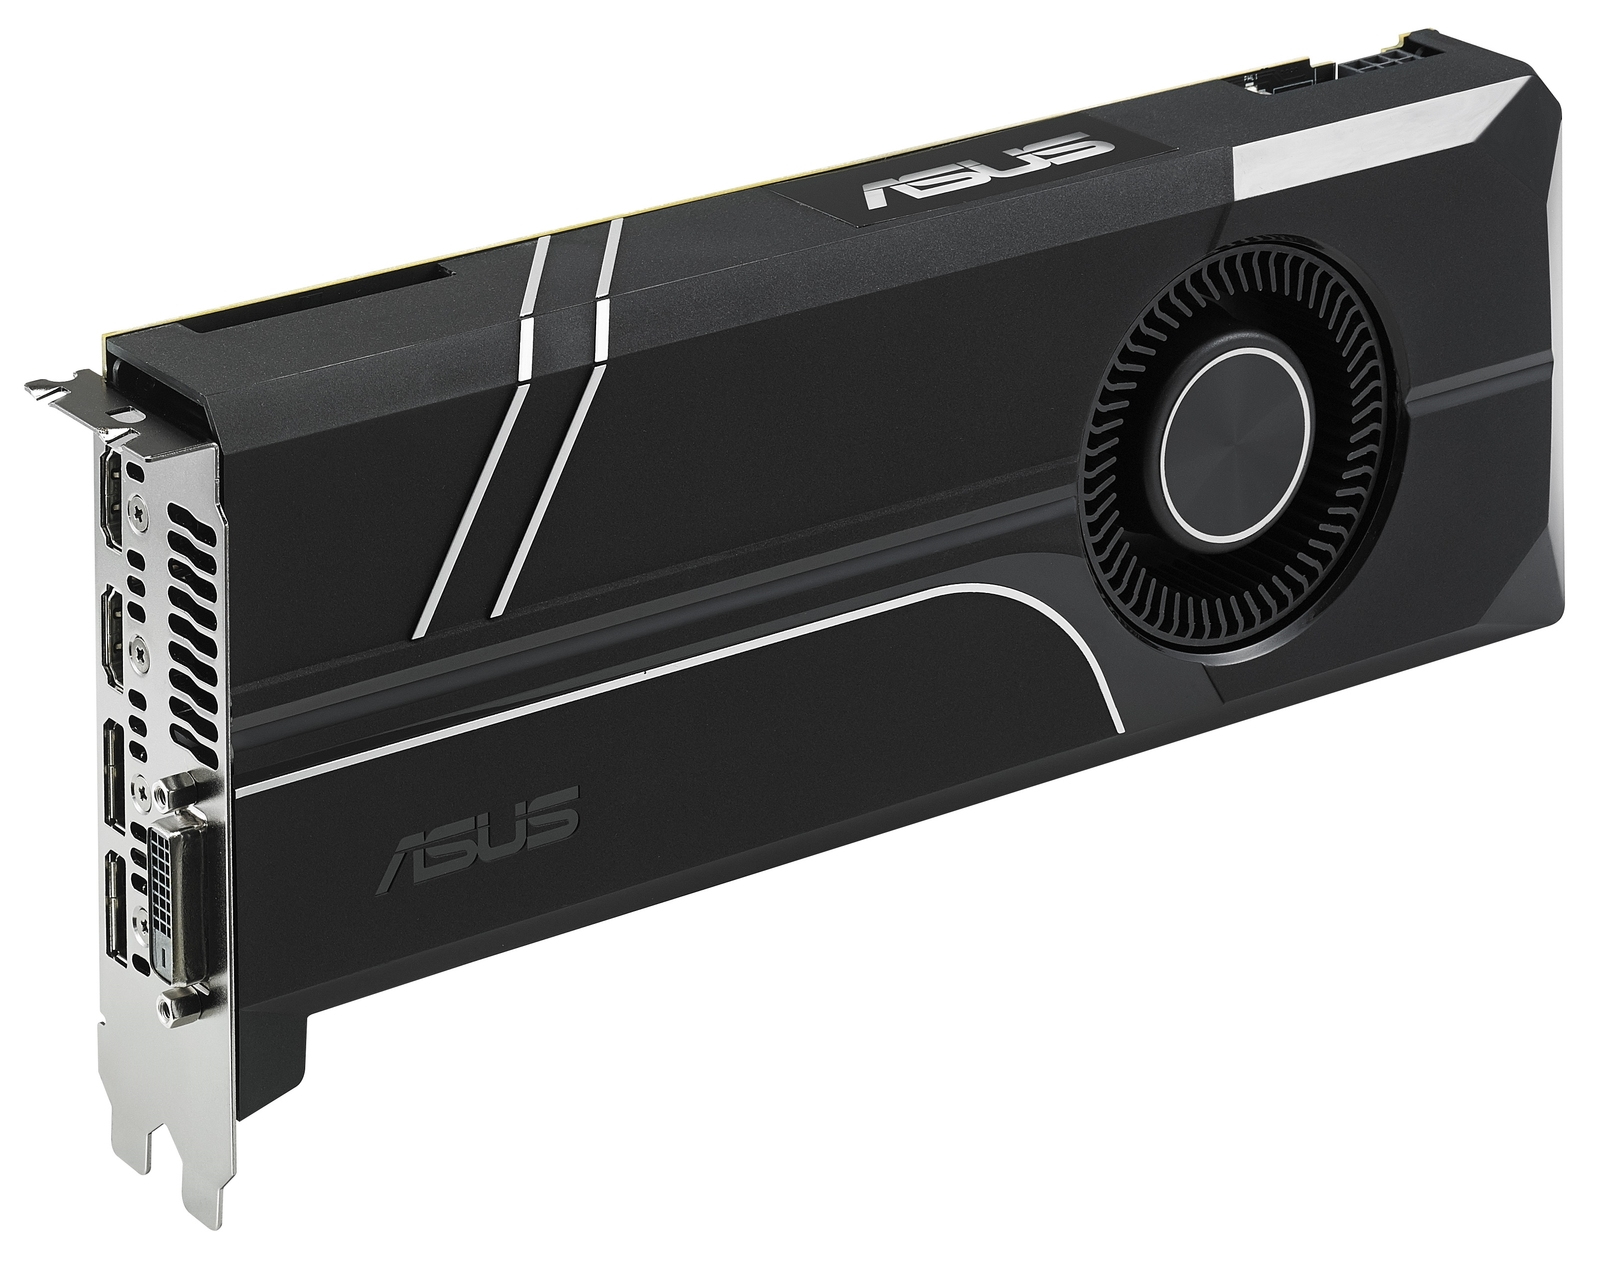 ASUS GeForce GTX 1060 Turbo 6GB Graphics Card image